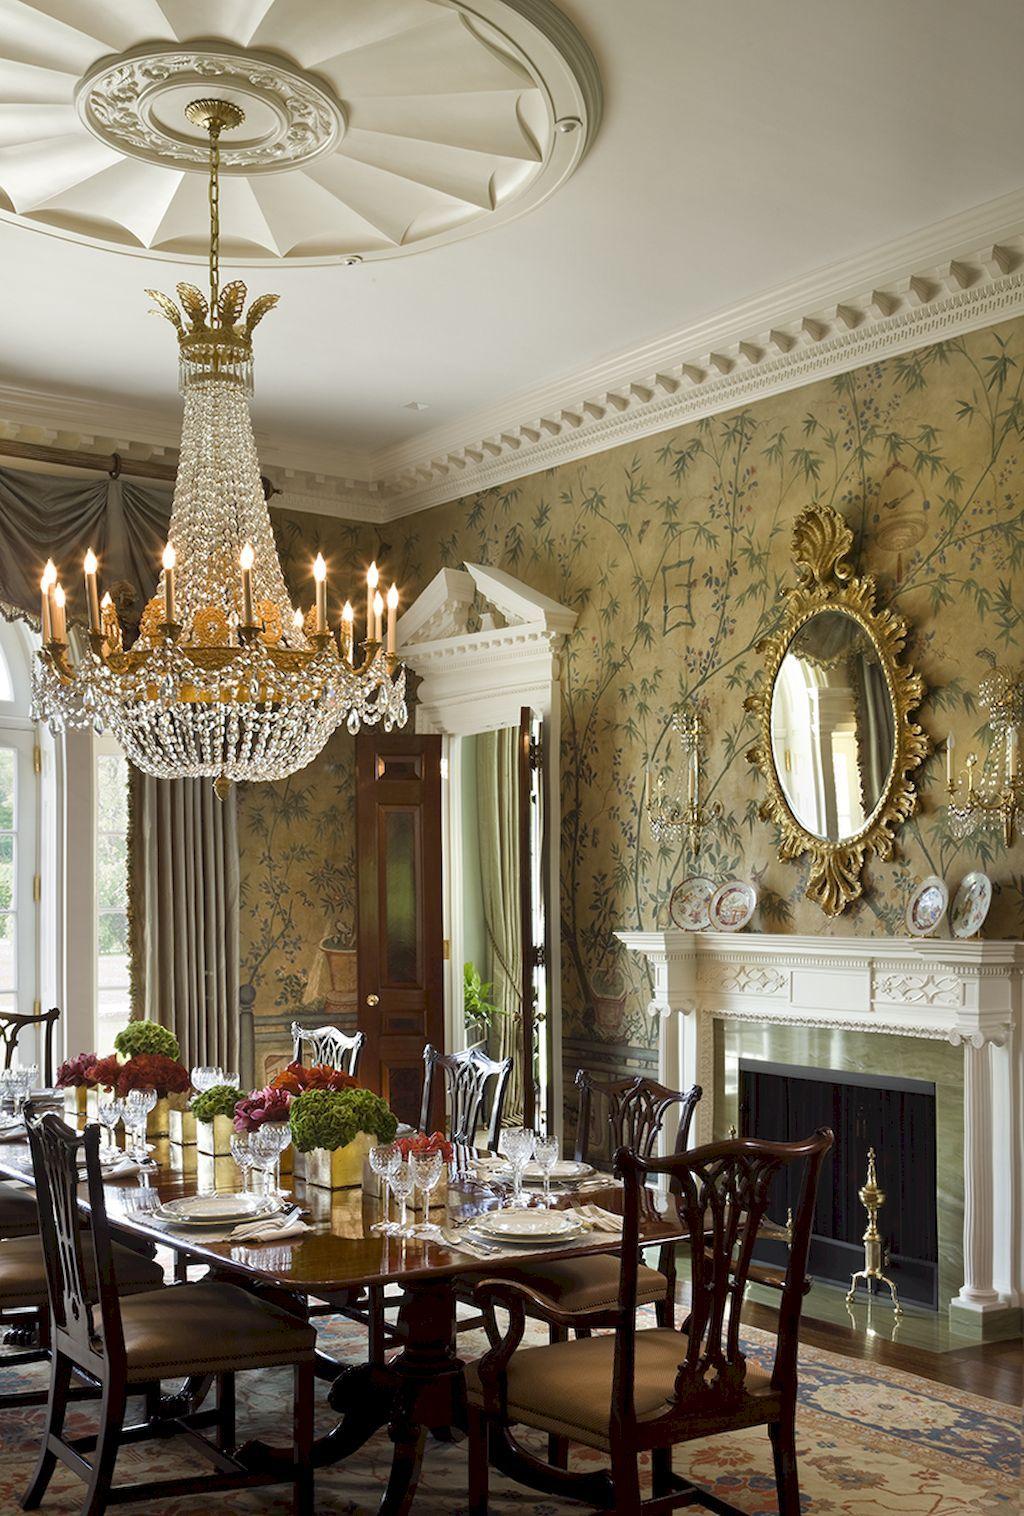 55 Vintage Victorian Dining Room Decor Ideas  Victorian Dining Unique Victorian Dining Room Decor Design Decoration